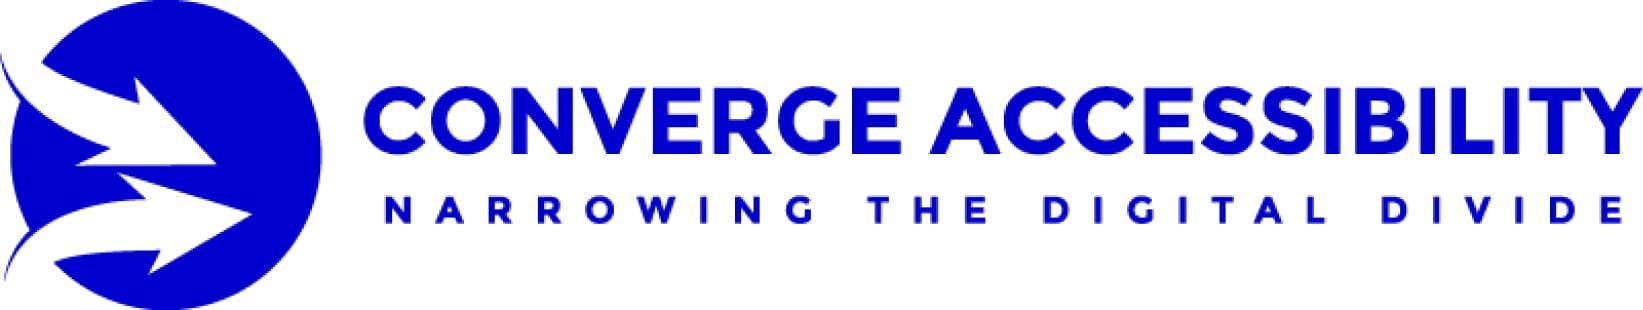 Converge Accessibility Logo